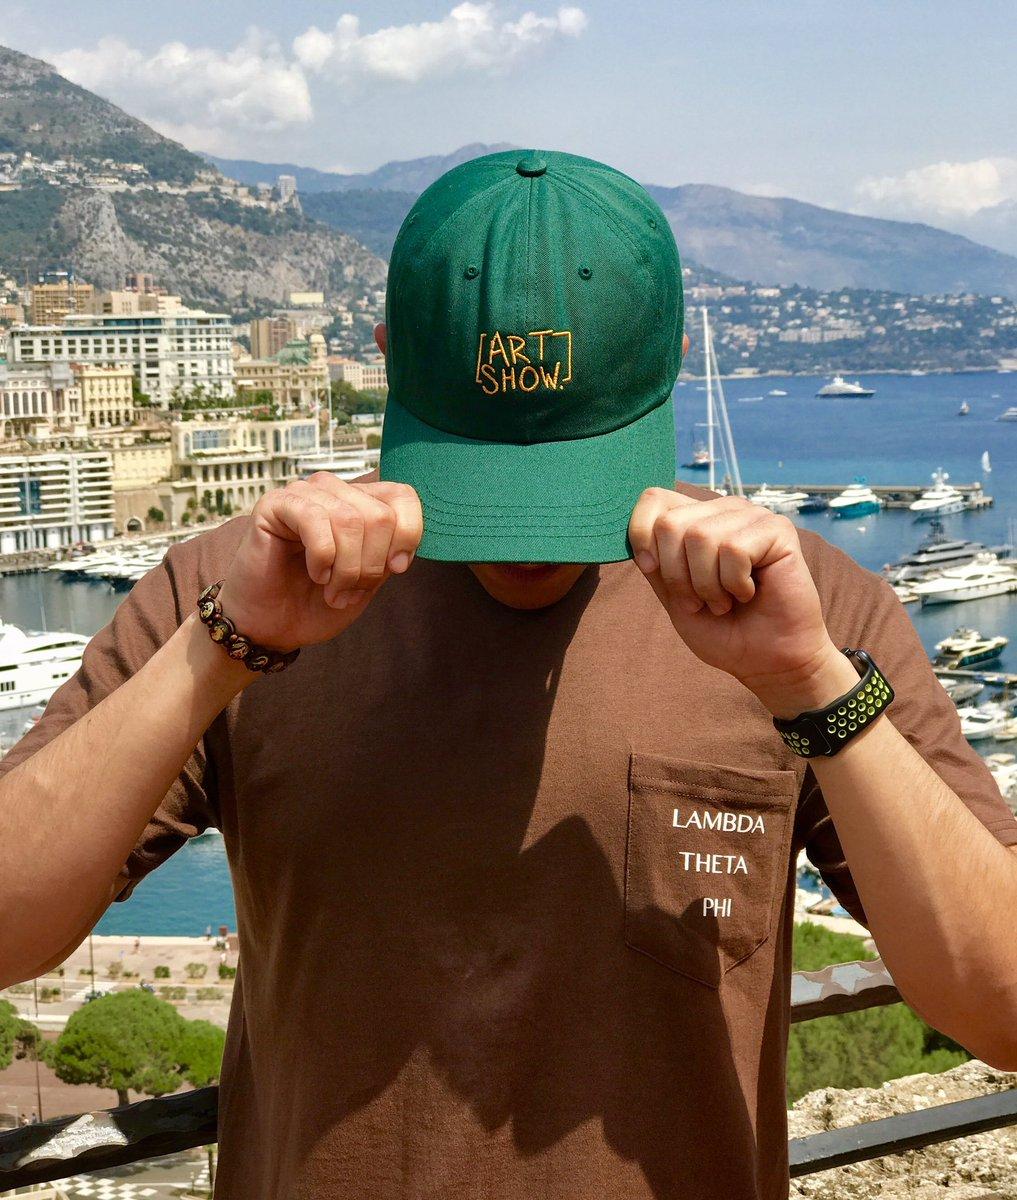 On the other side of the world promoting friend&#39;s business @ImIvanCalderon @dannirovnak @siuoLbackwards @ArtShowTampa #Monaco  <br>http://pic.twitter.com/9uFvXeJqMO